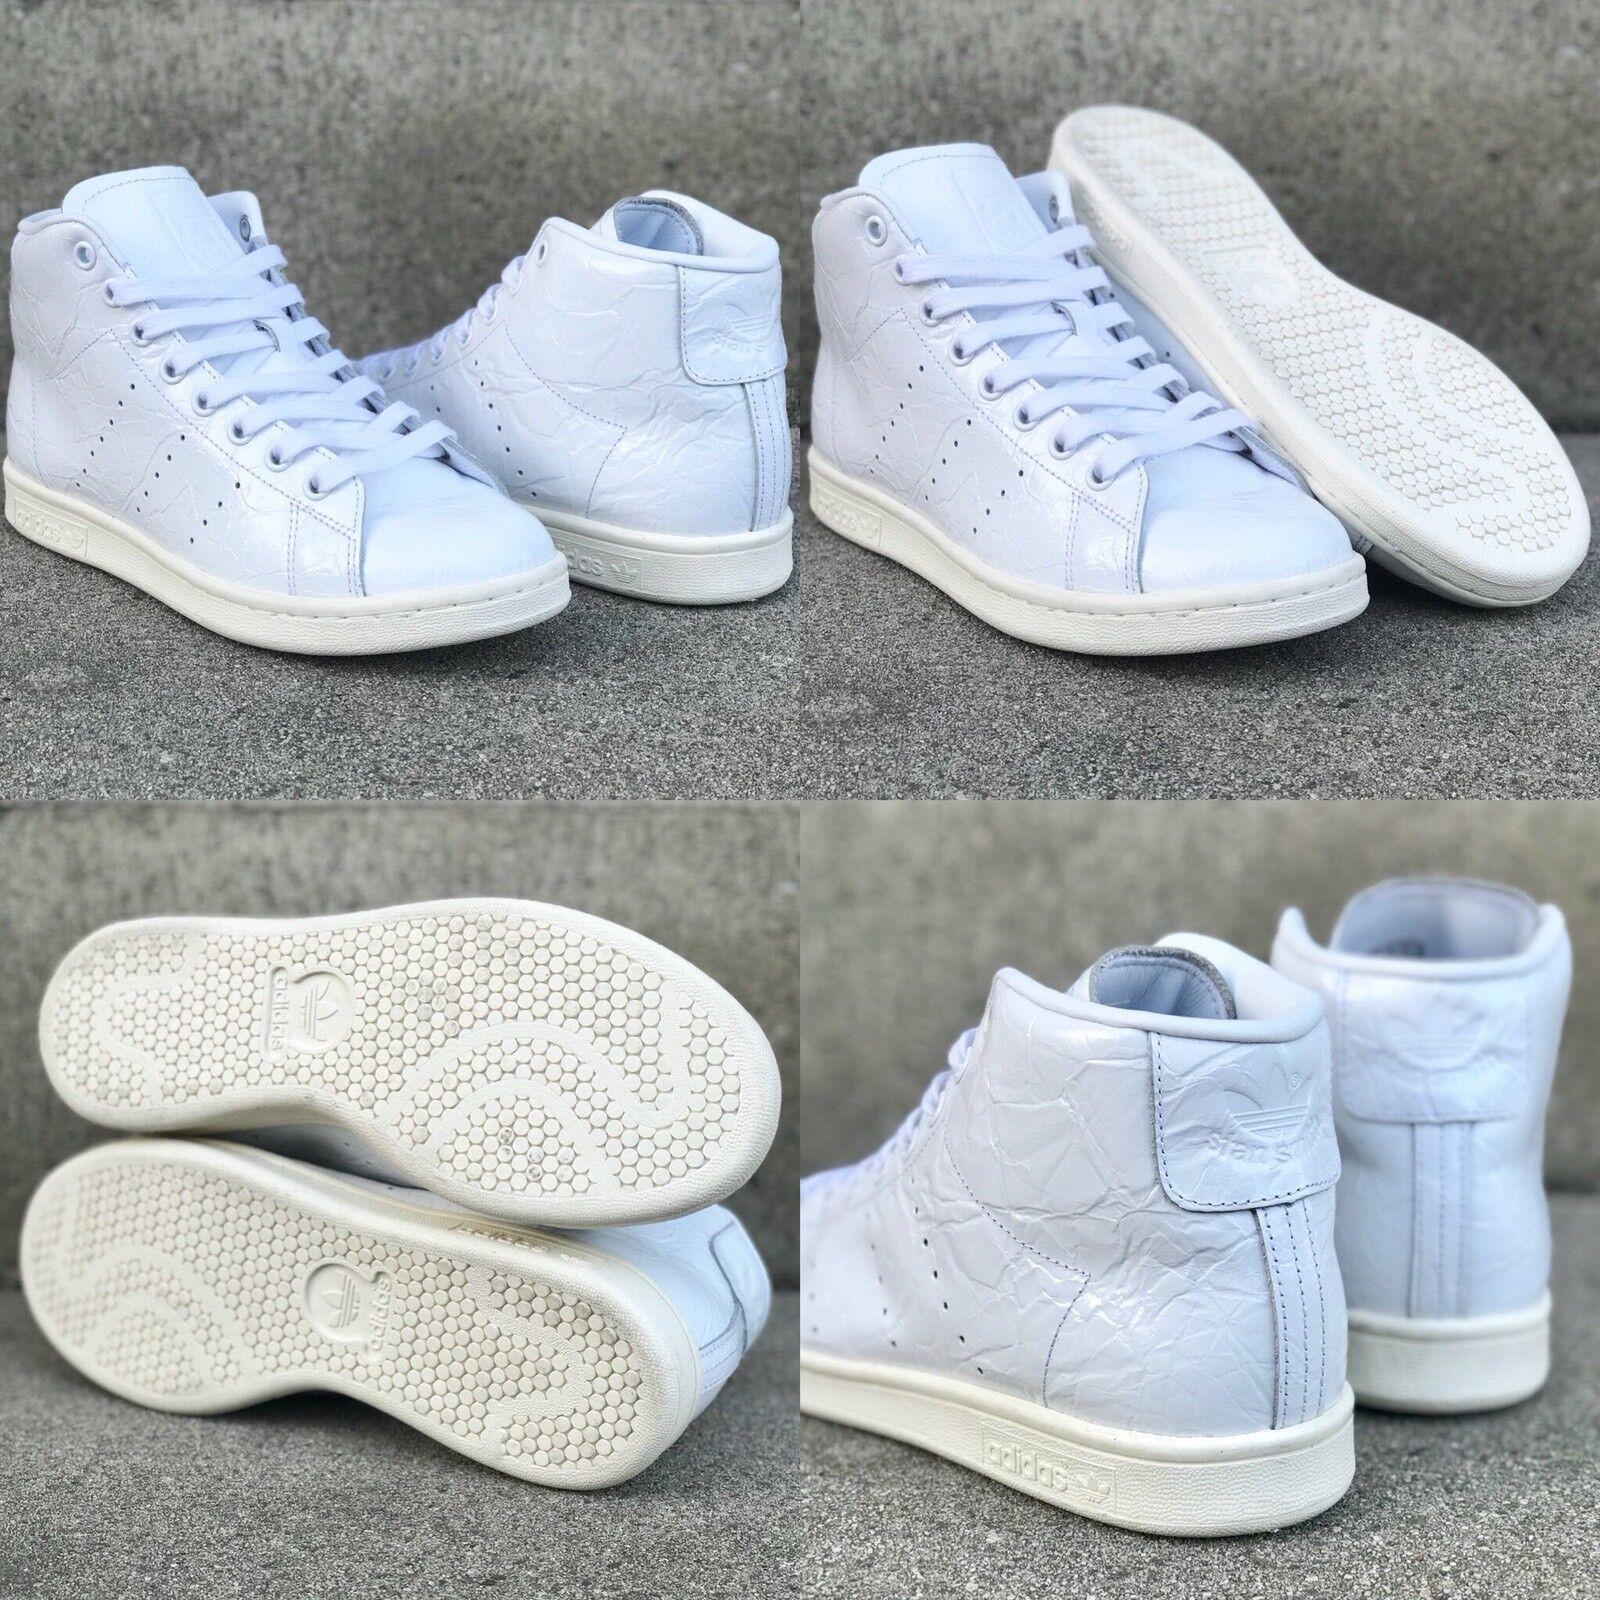 NEW ADIDAS STAN SMITH MID women's originals shoes sz 6.5 white shiny sneakers